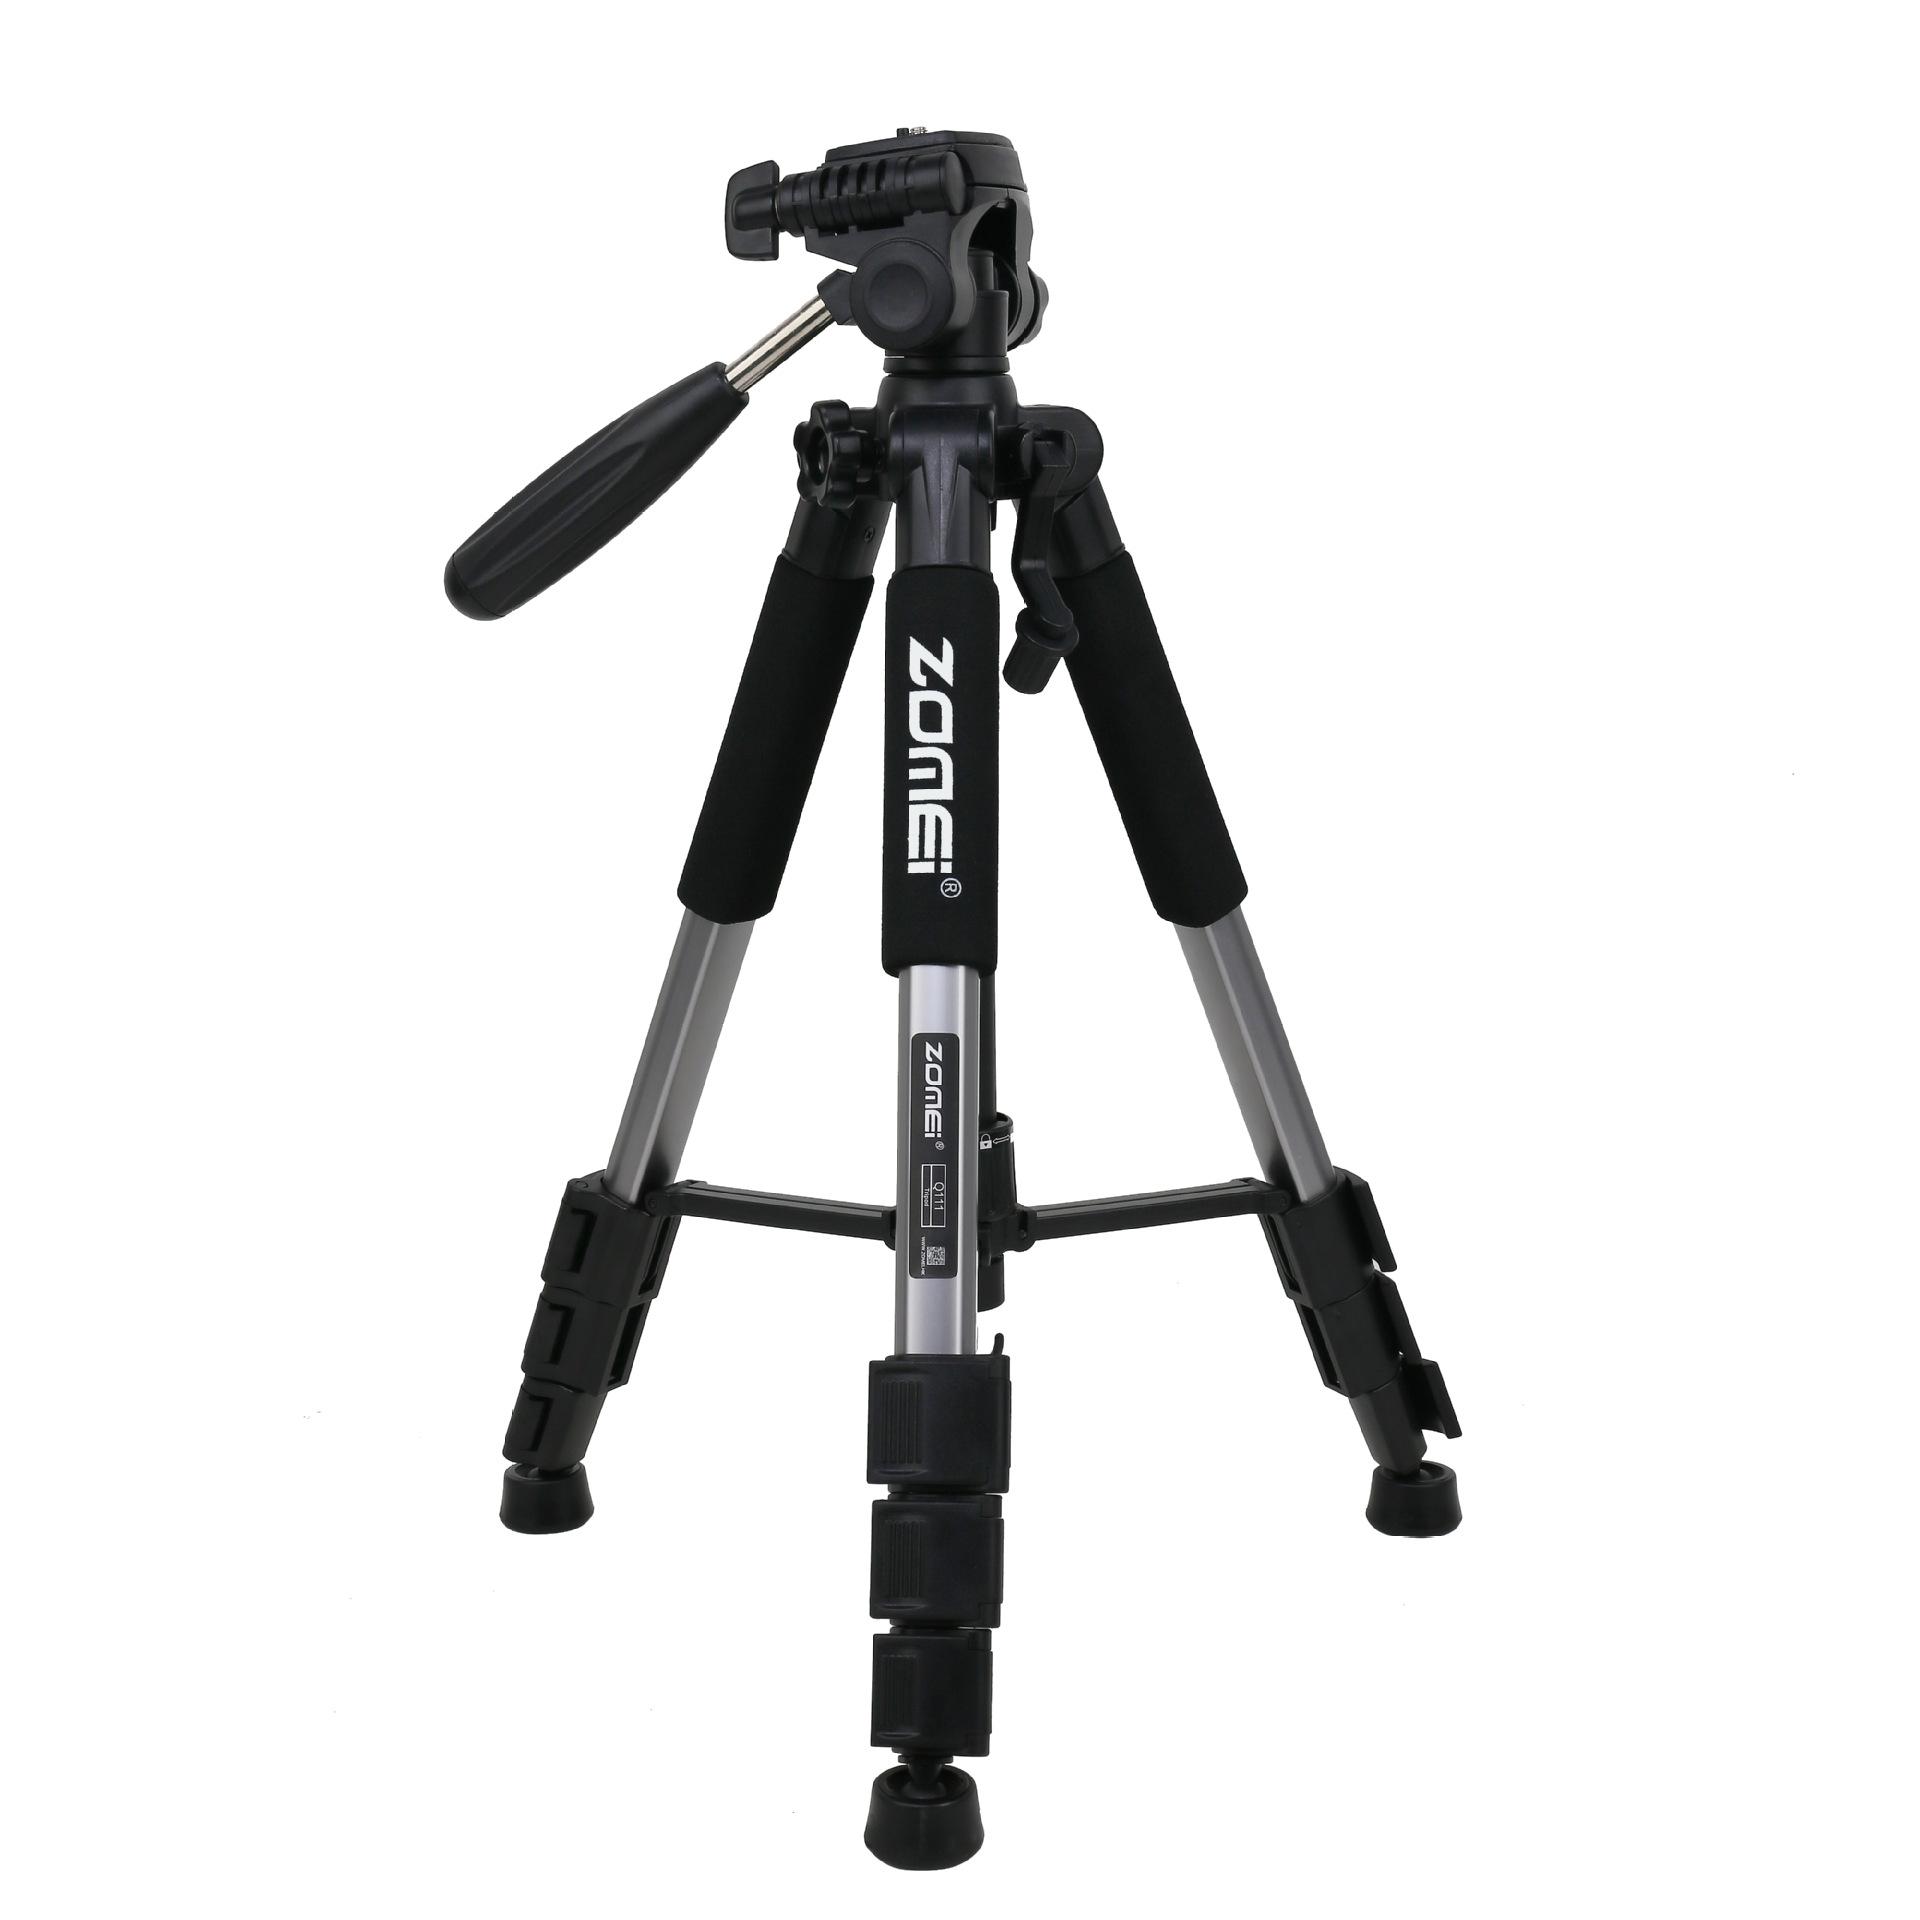 Mobile Phone Bracket Pro Aluminium Q111 Tripod for DSLR Camera Video Fill-in Light Bracket silver gray